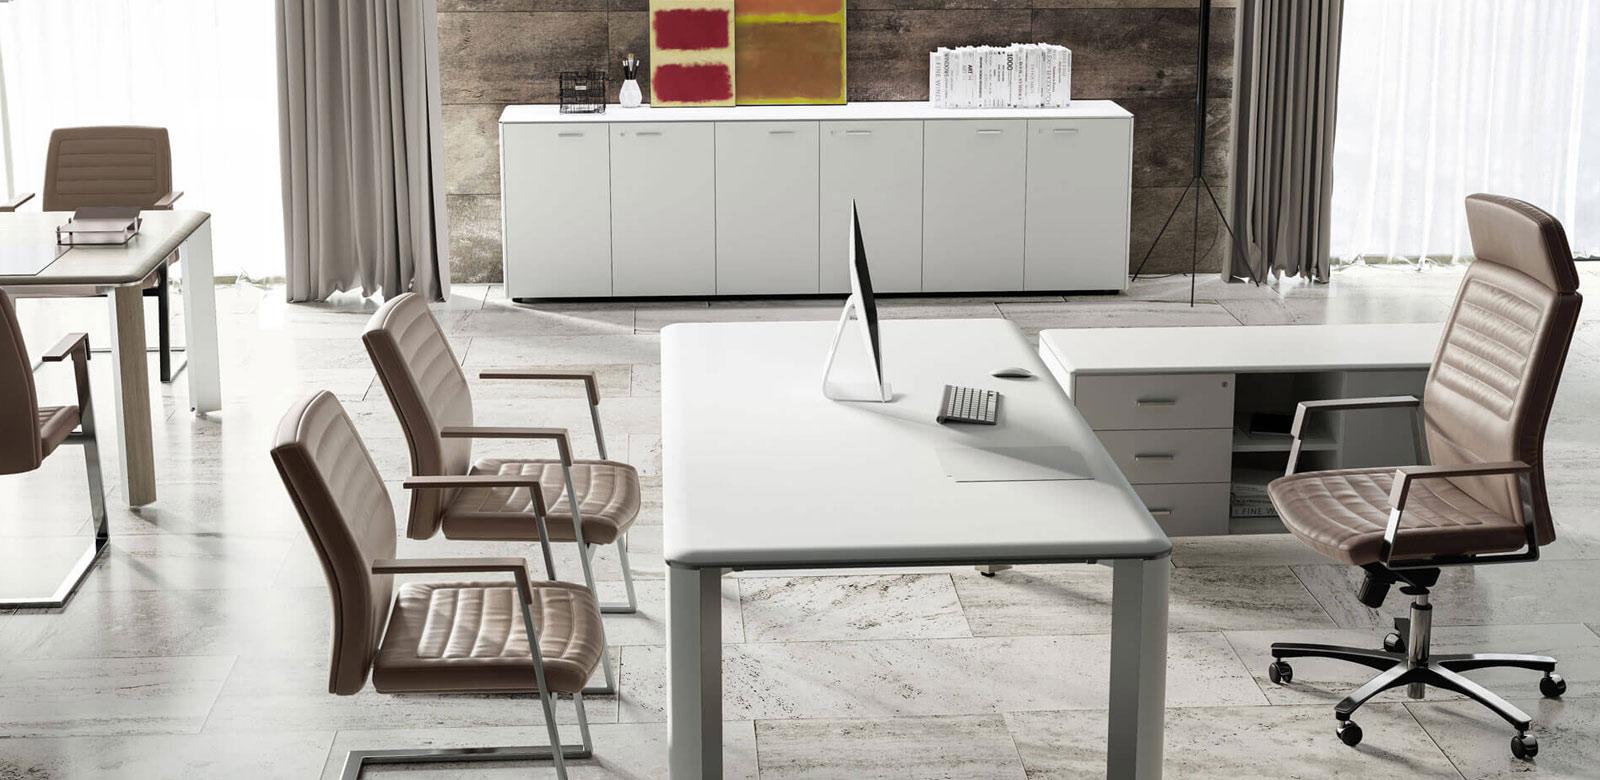 Arredo ufficio outlet elegant outlet arredo ufficio with for Arredamento gratis milano